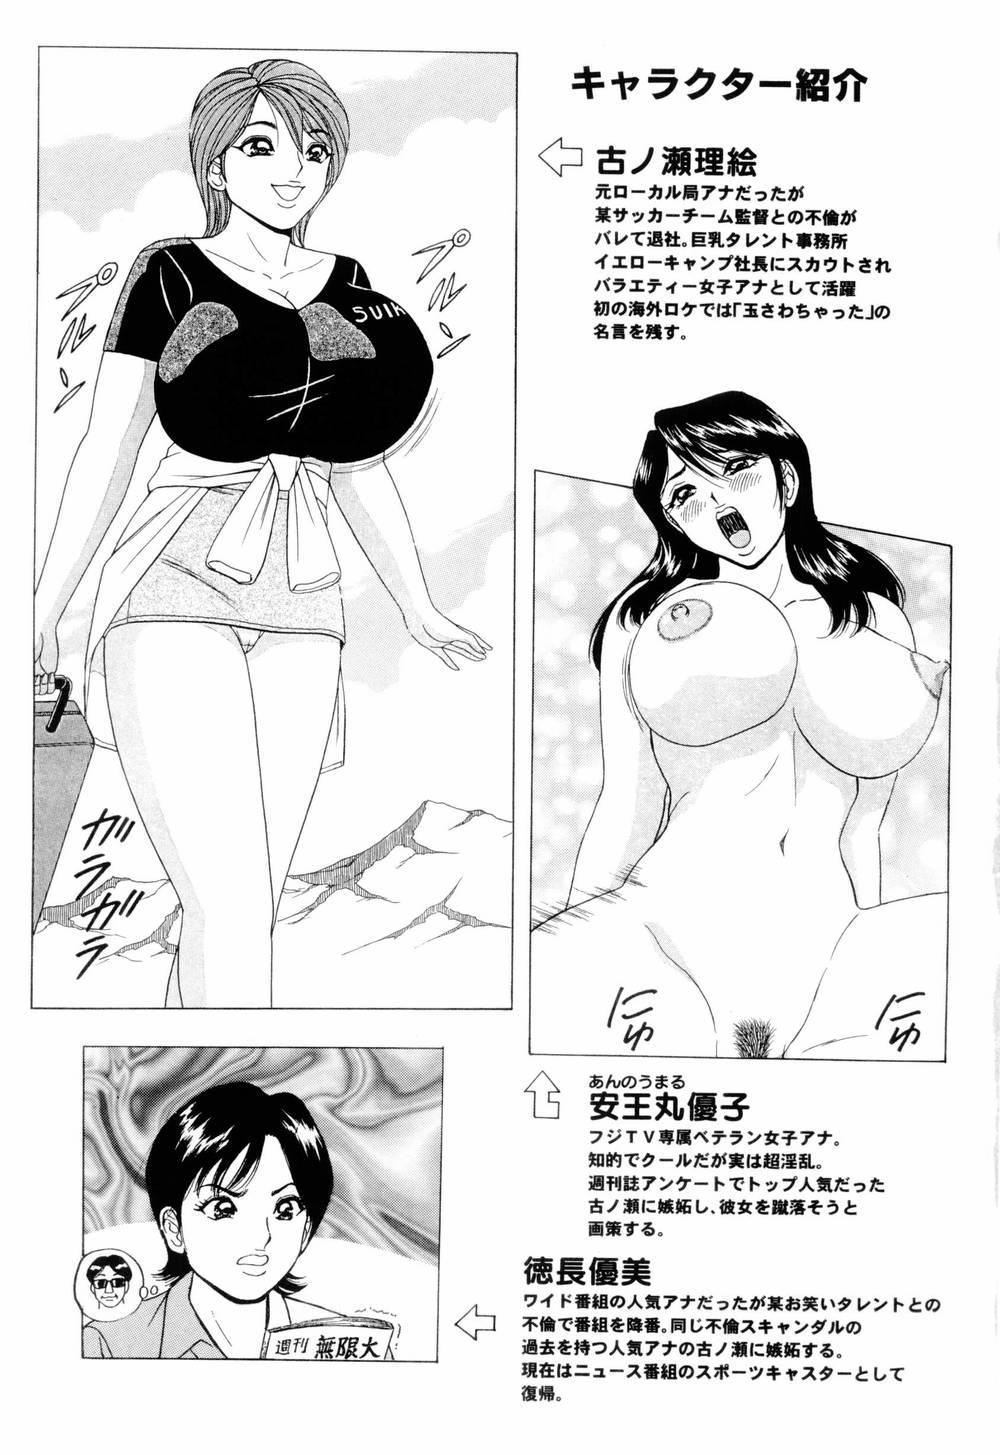 SuiCup Joshi Announcer Jikkyo Chukei Rape 8